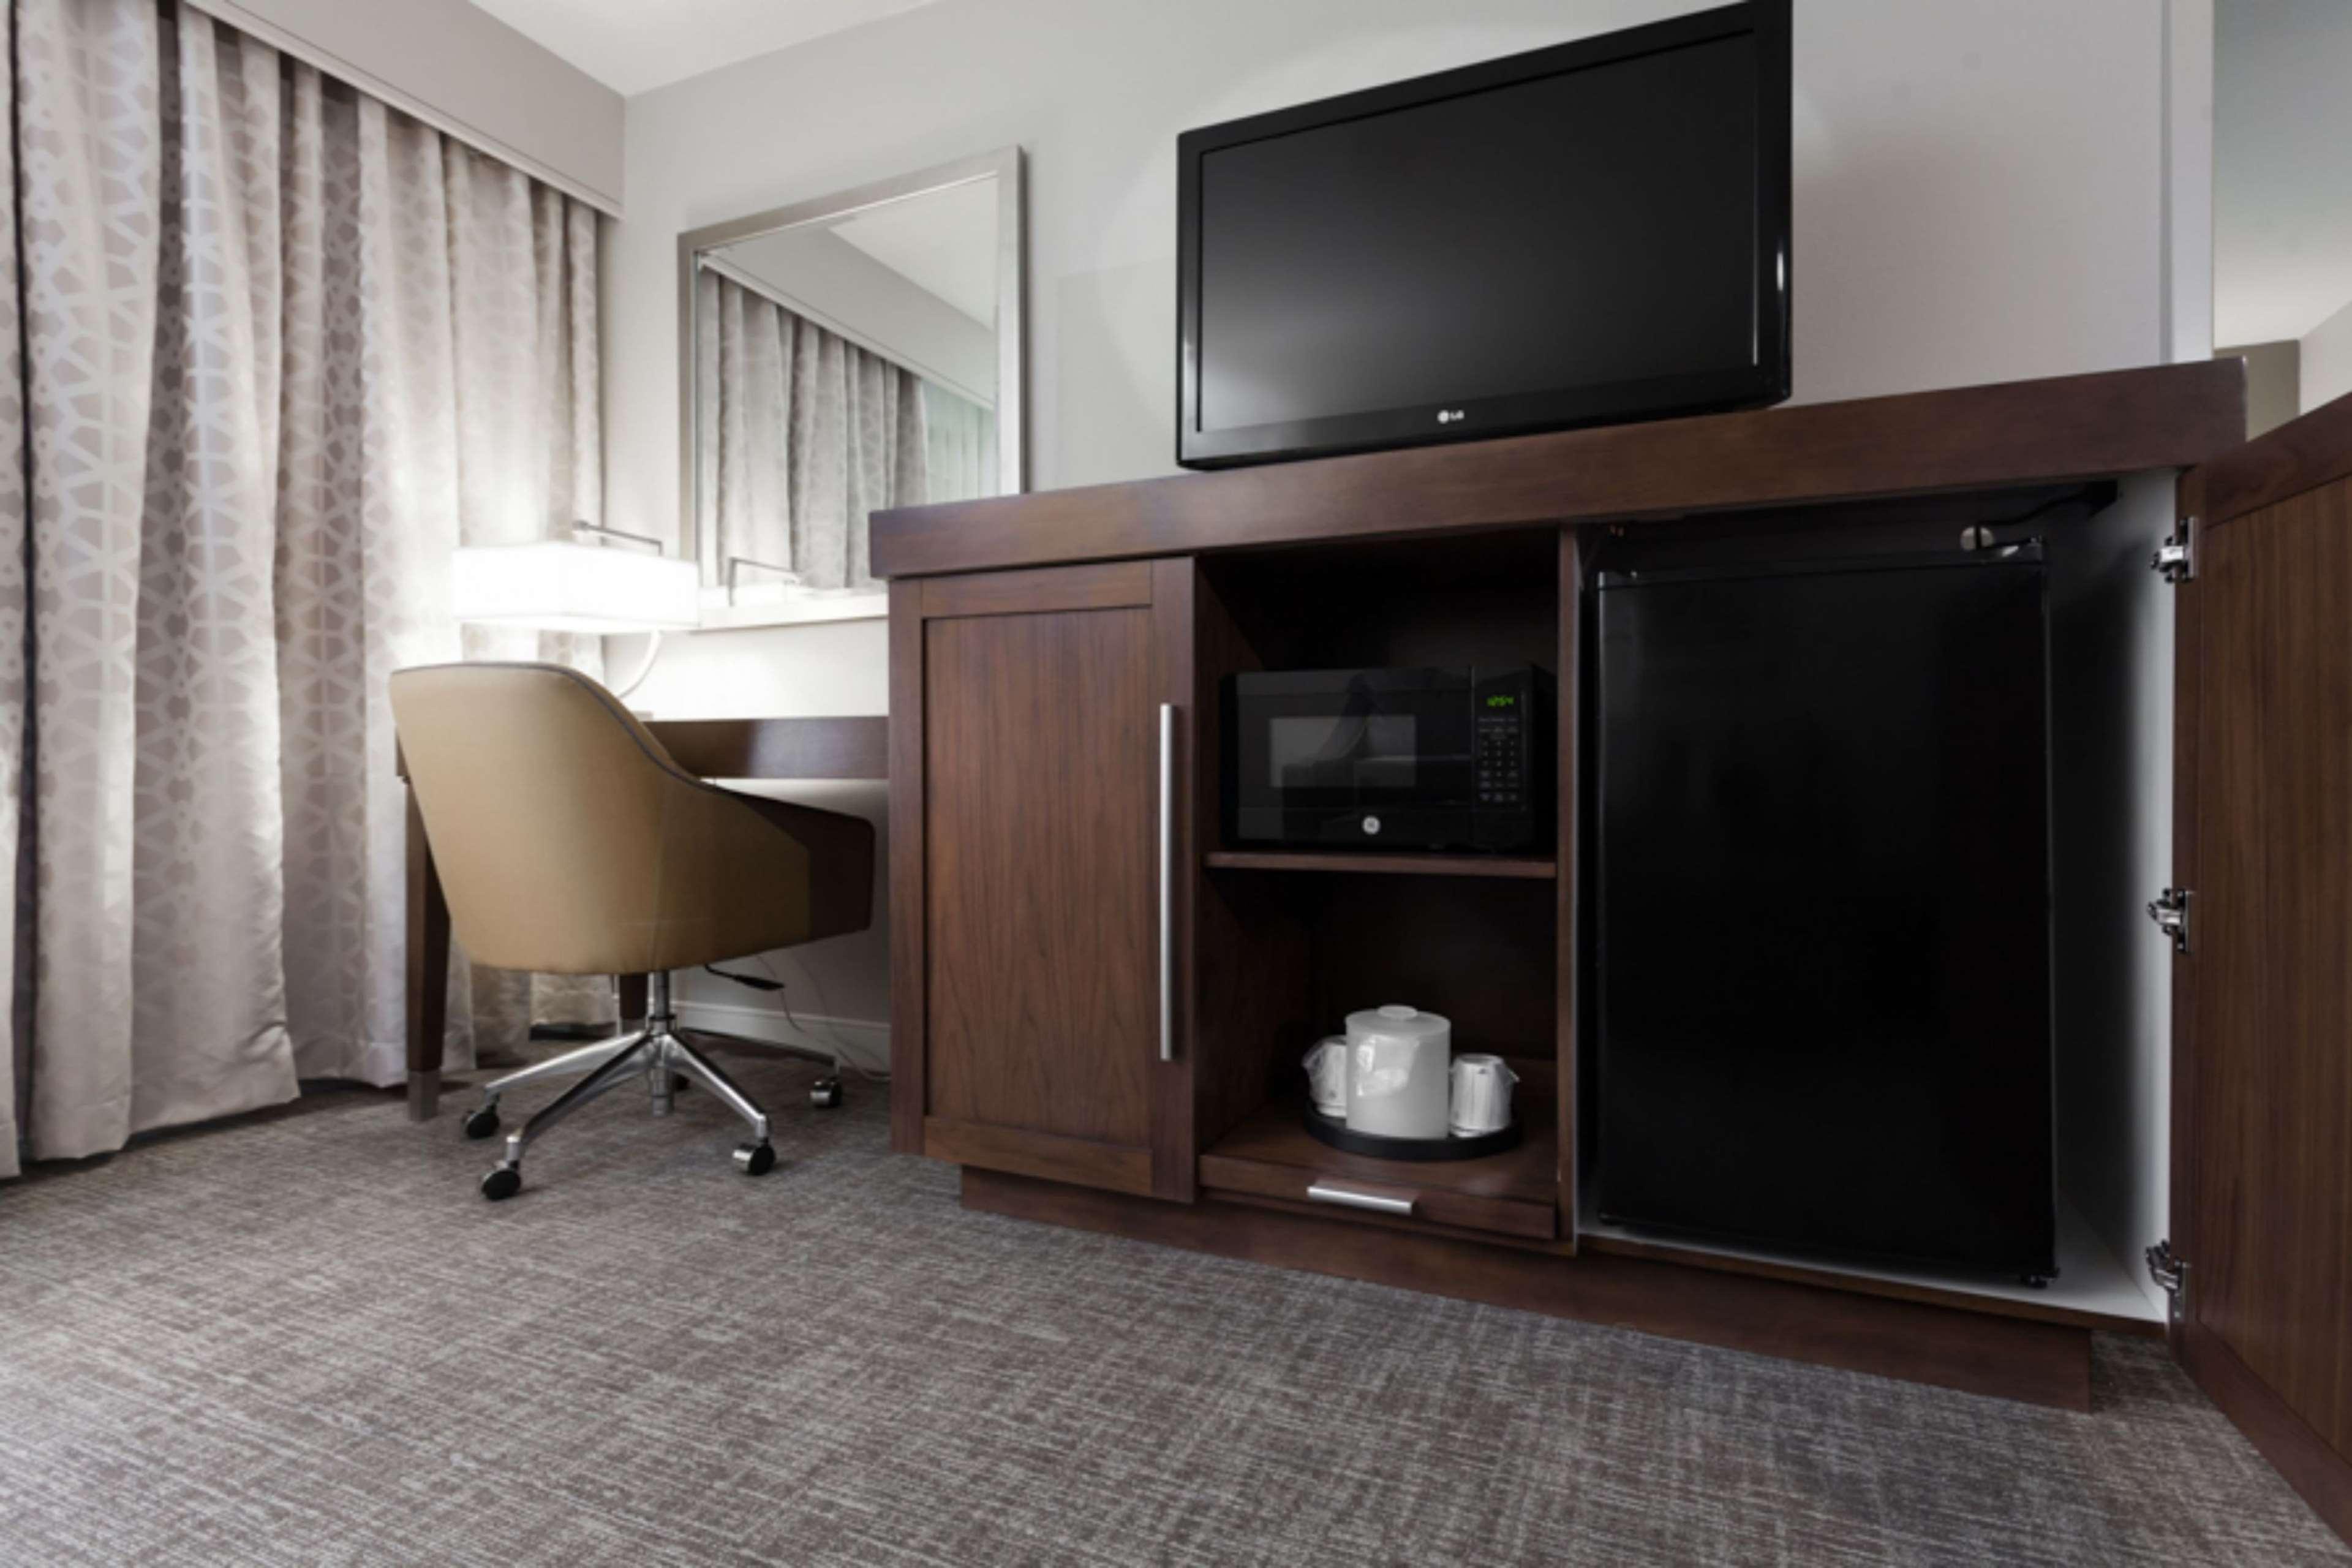 Hampton Inn & Suites Dallas-DFW Airport North-Grapevine image 25